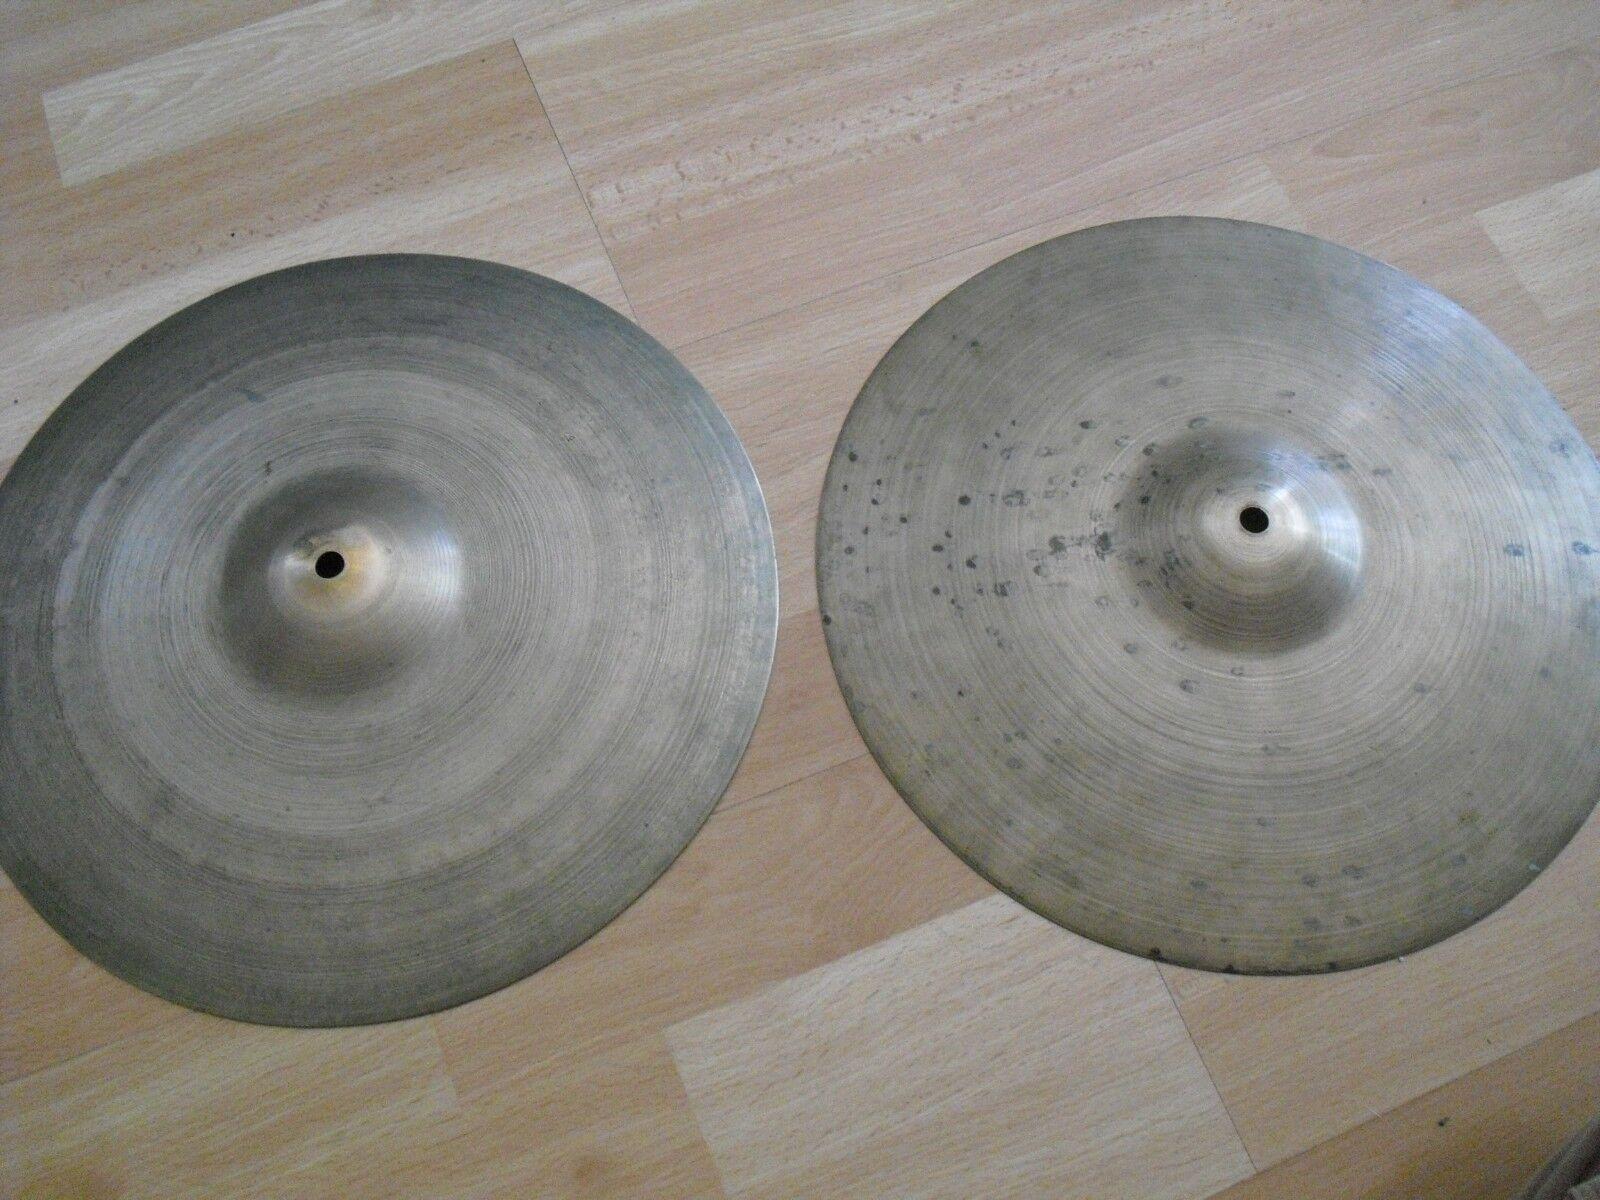 13  Vintage 40s Avedis Zildjian Trans Stamp HiHats Hi Hats Cymbals